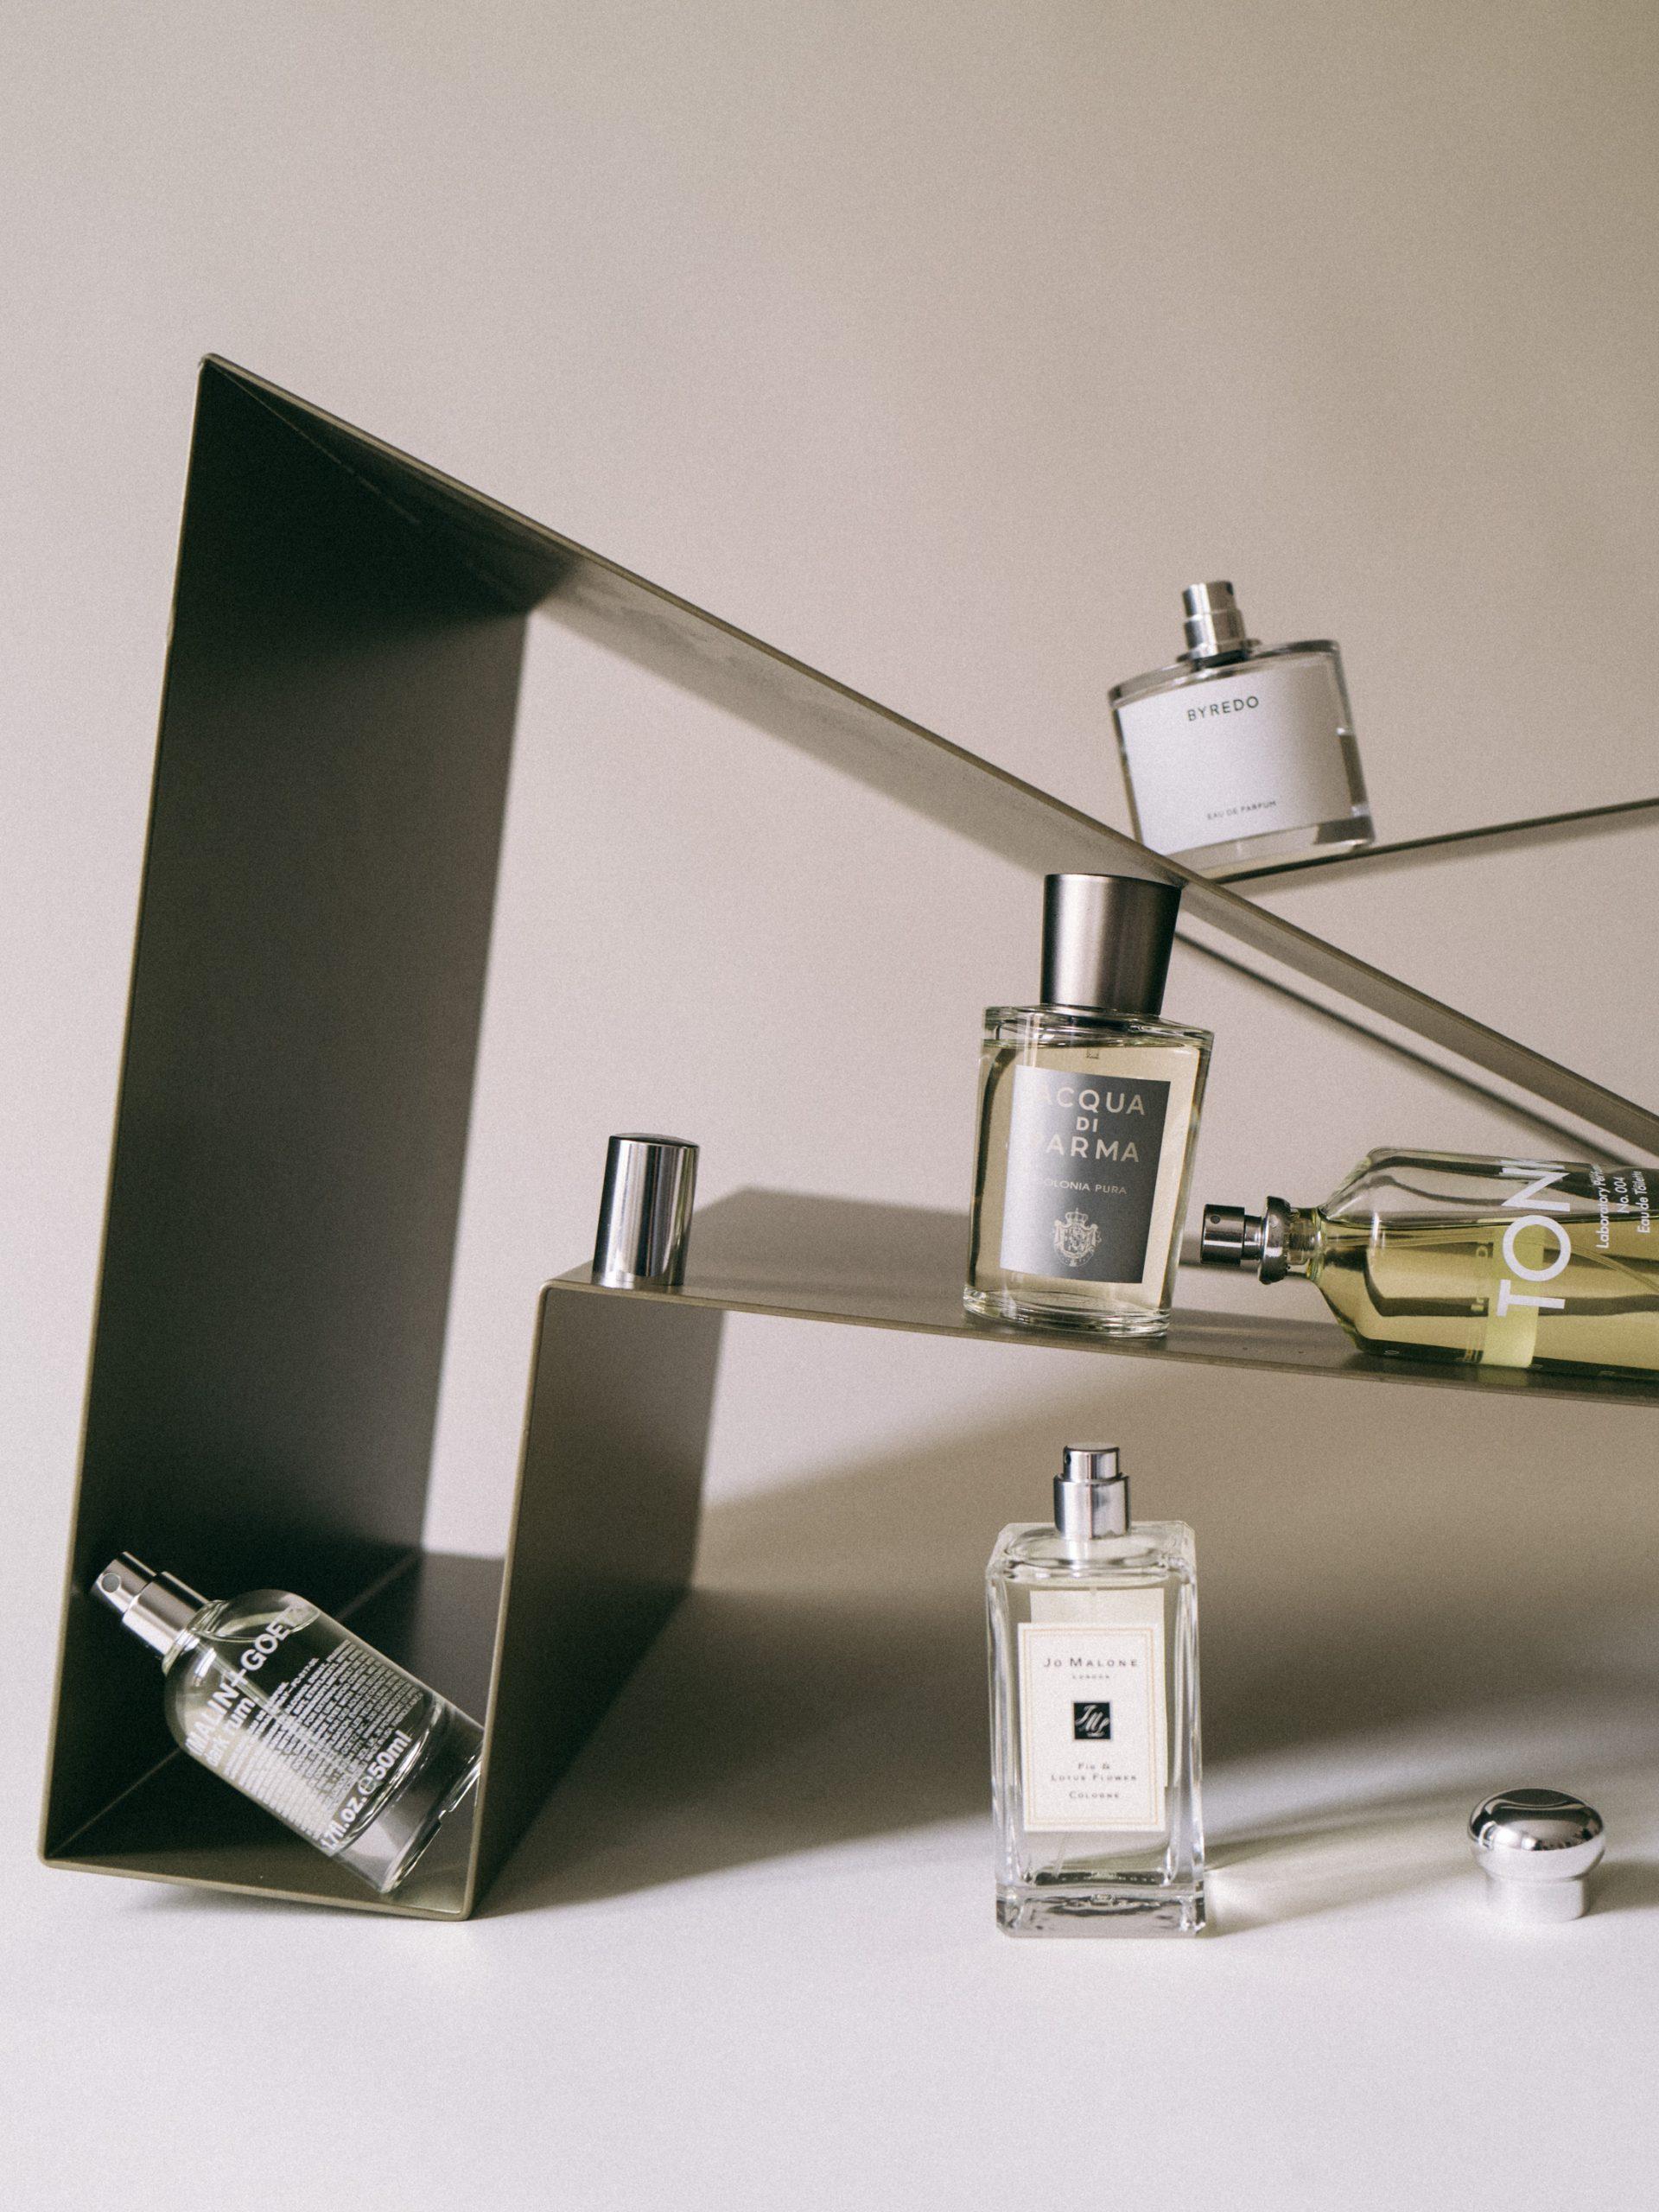 FRNKOW-journal-scent-fragrances-favorite-2